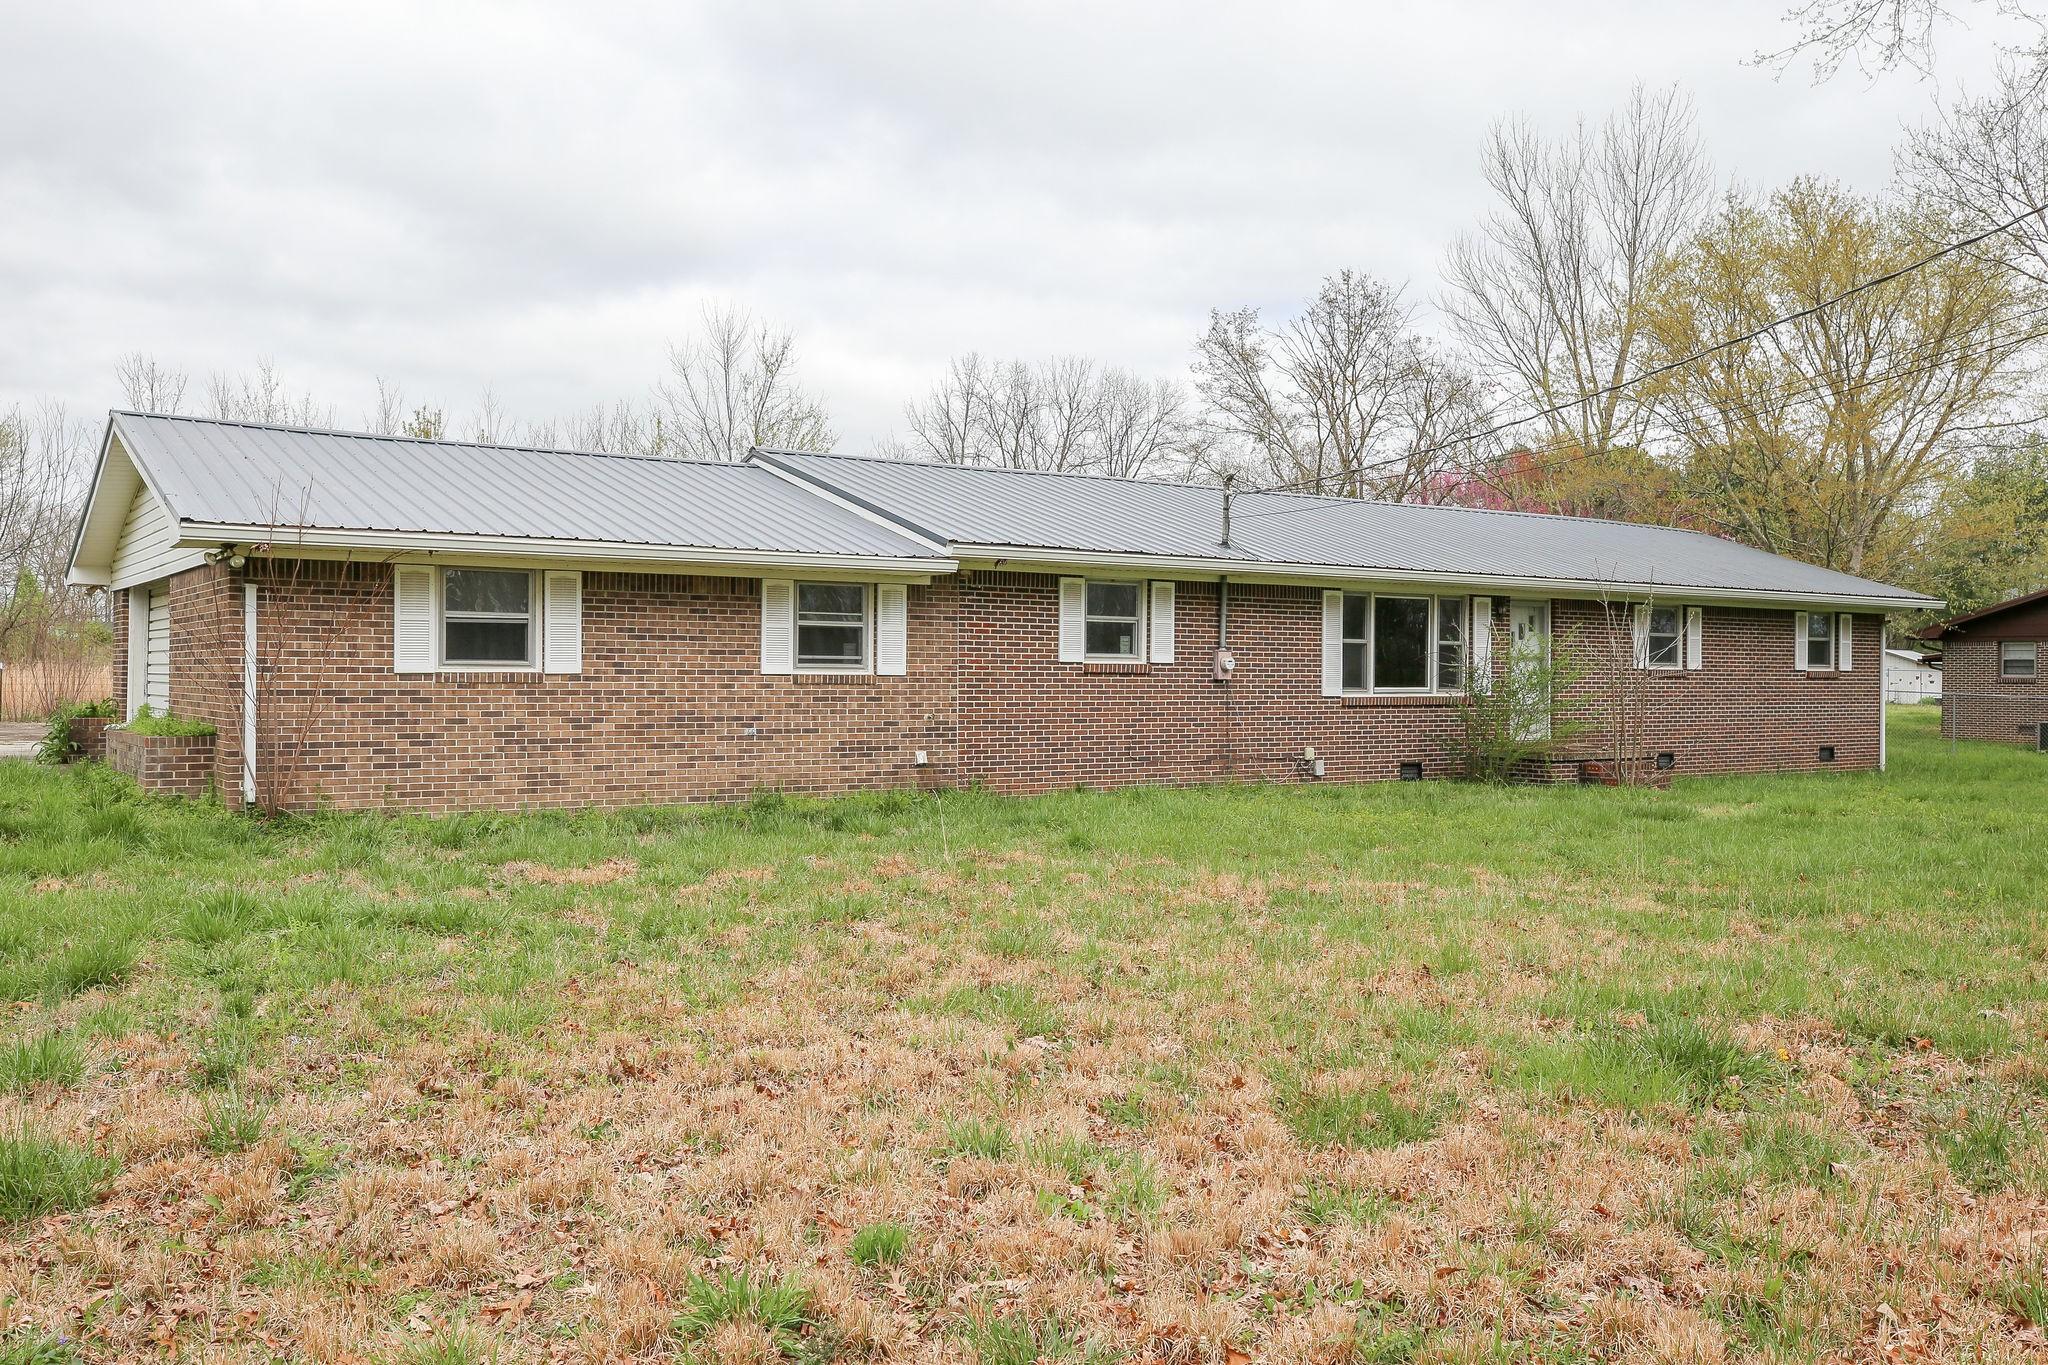 166 Bains Rd, Hillsboro, TN 37342 - Hillsboro, TN real estate listing